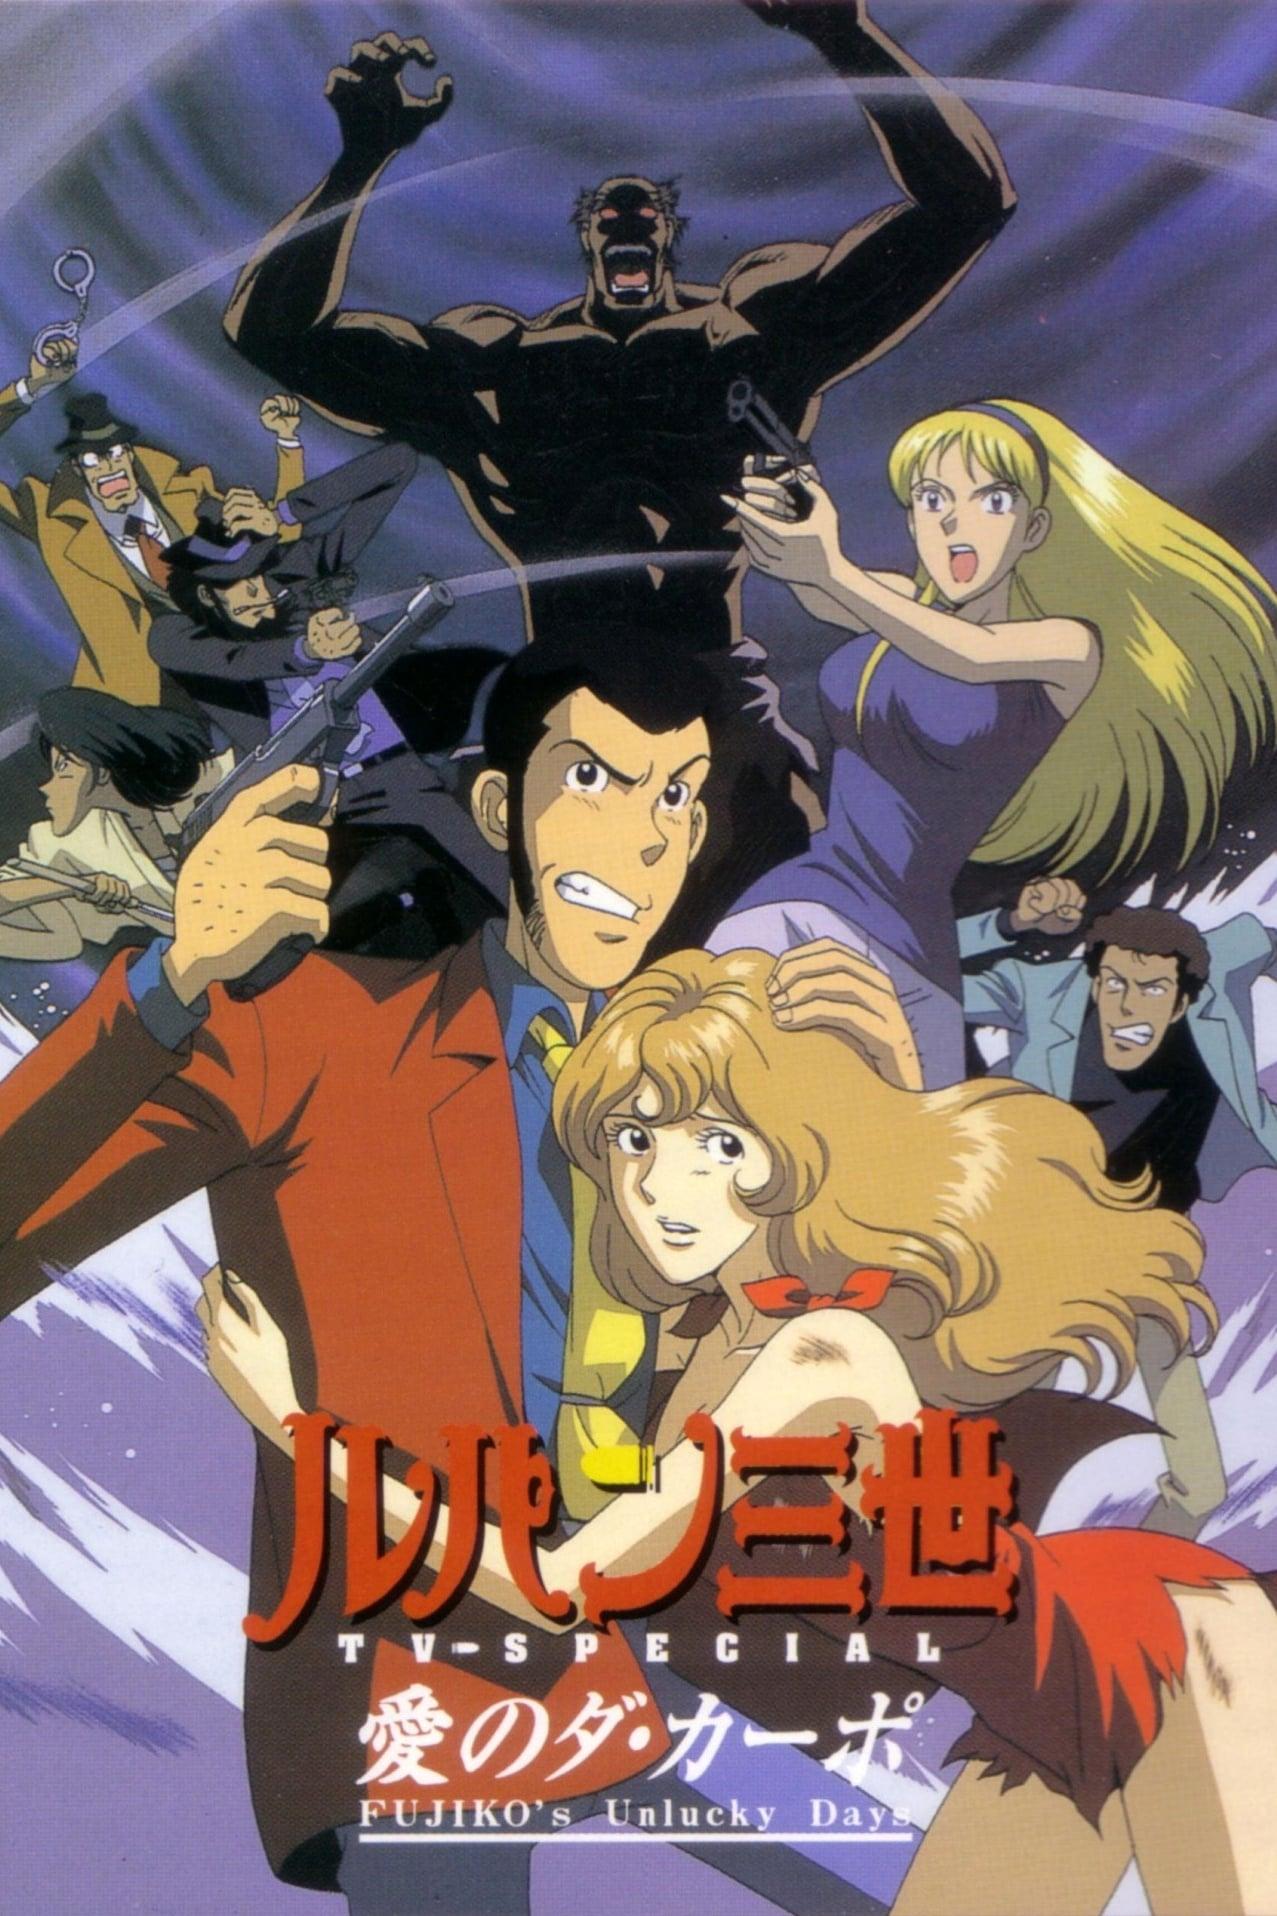 Lupin the Third: Da Capo of Love - Fujiko's Unlucky Days (1999)